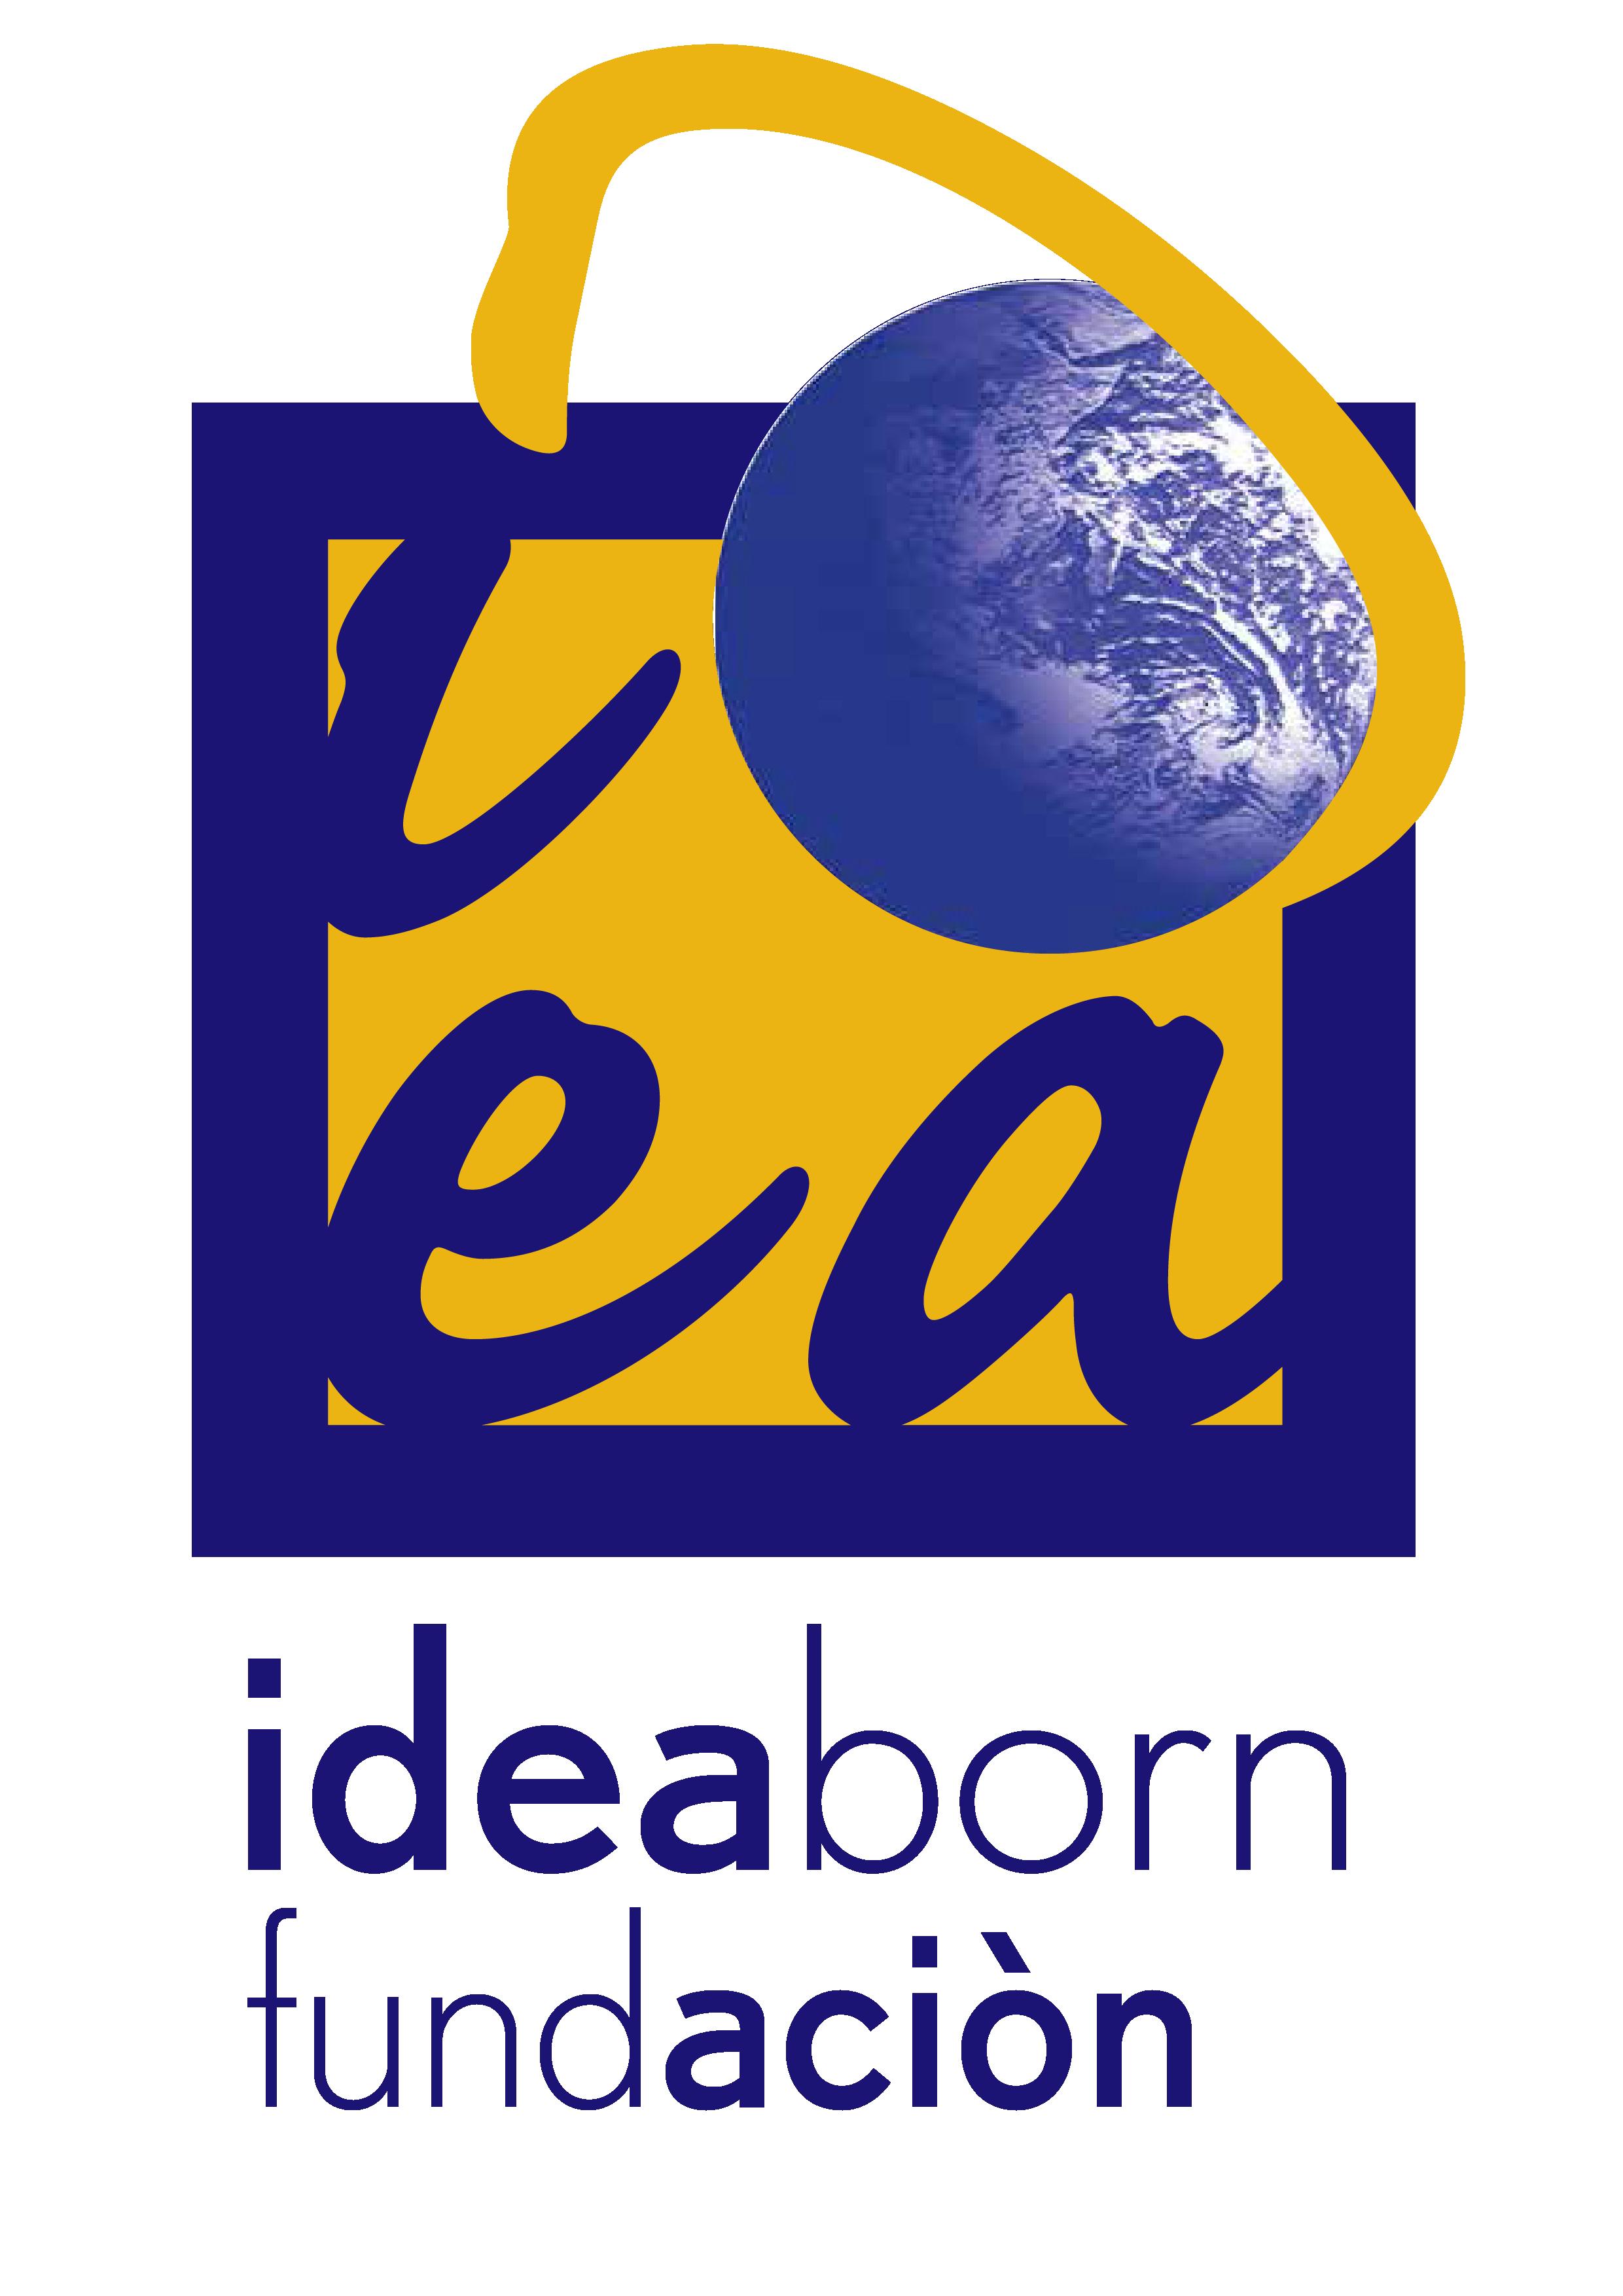 ideaborn